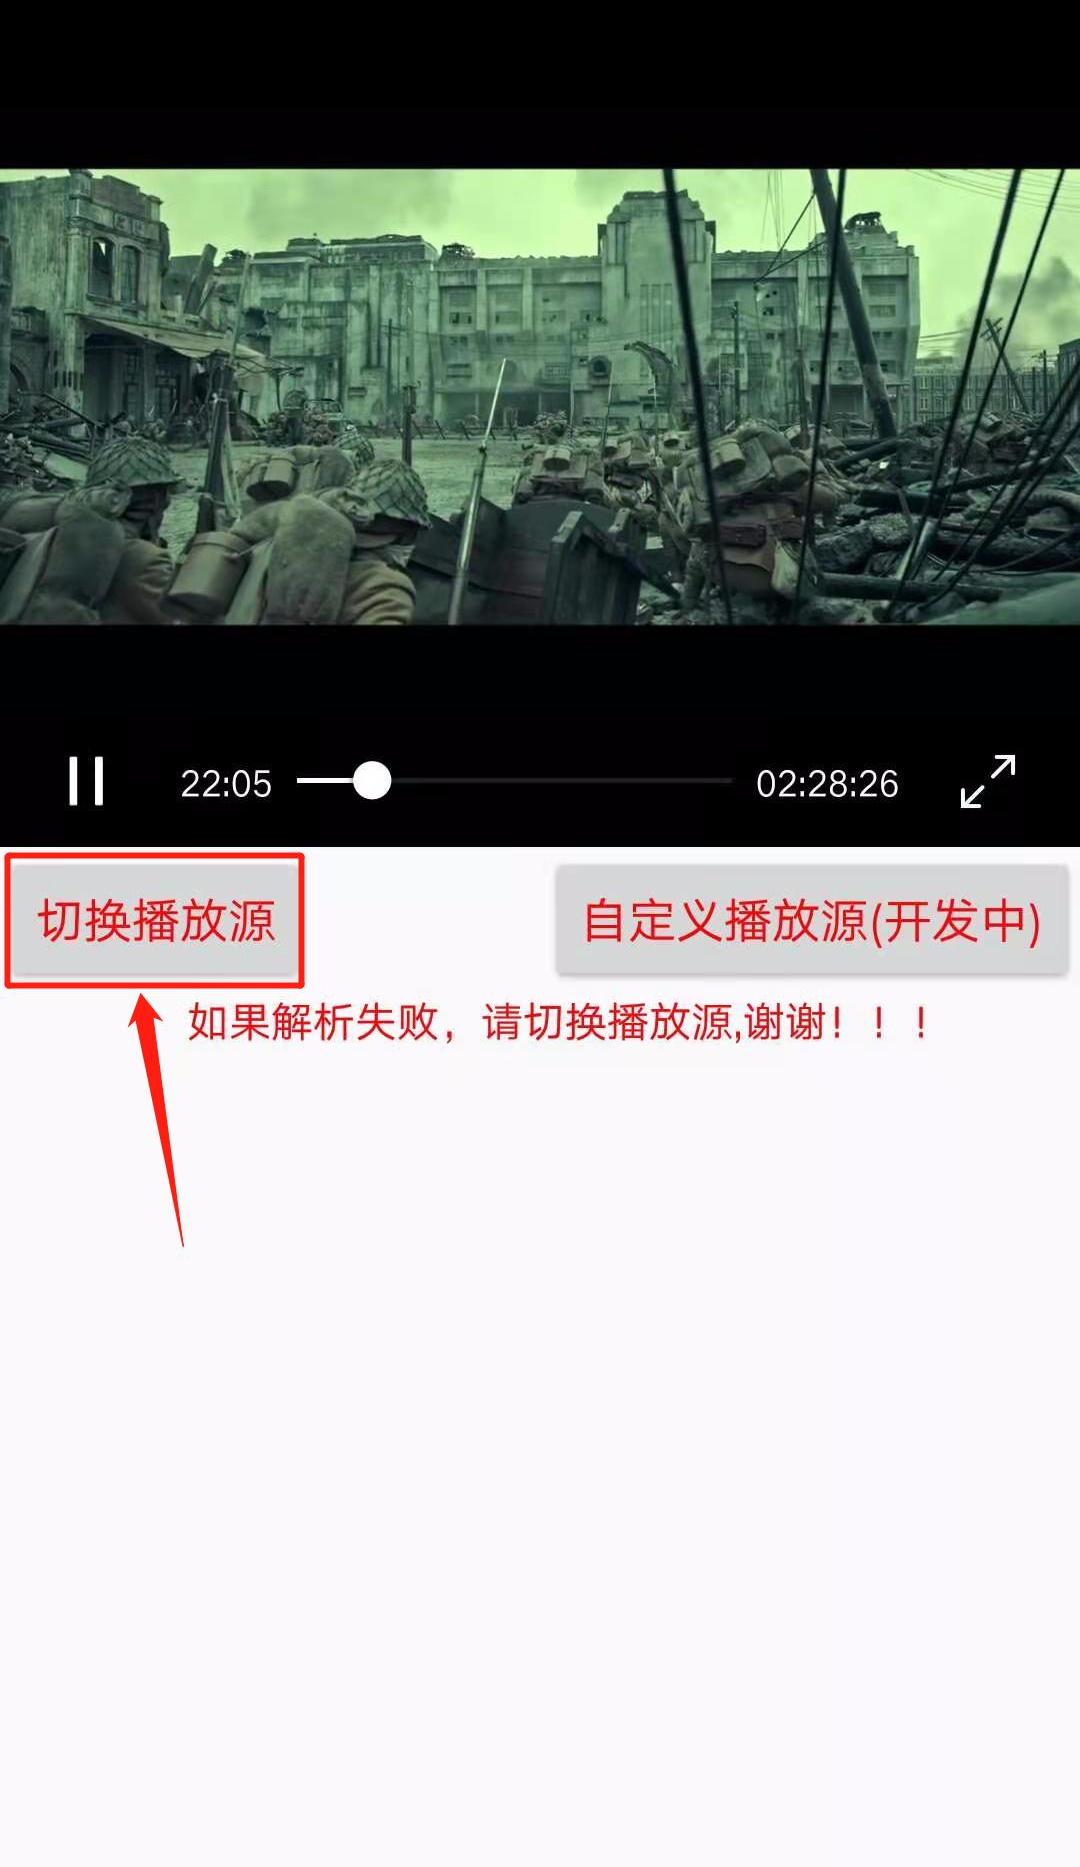 6003bc583ffa7d37b35d03b4 资源丰富的影视软件--端木视频VIP